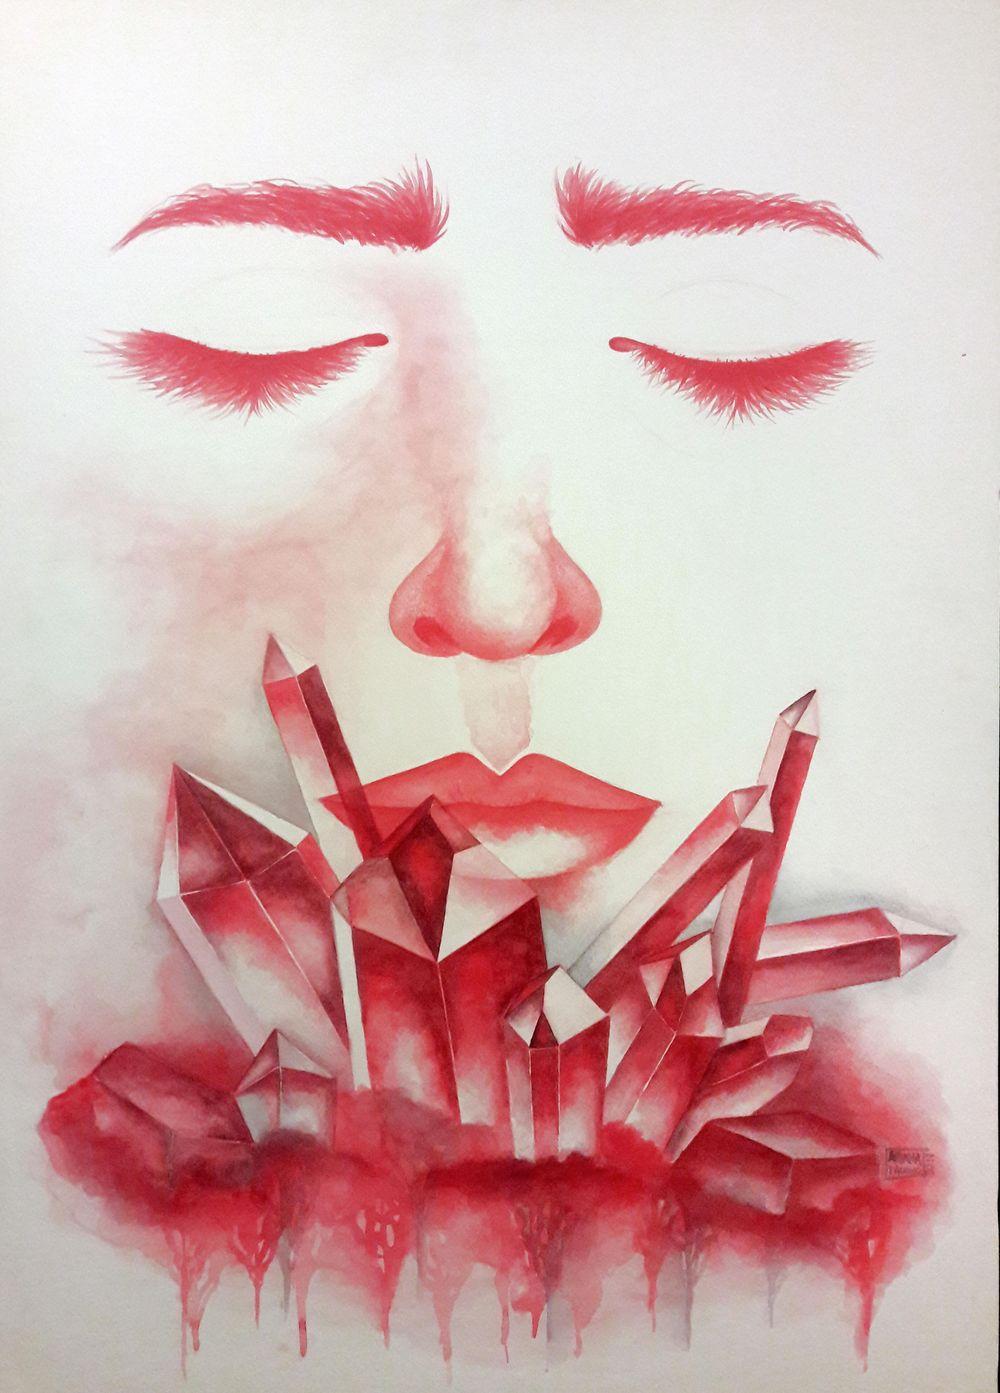 Ruby Tuesday ♪♫ | Ariana Iacono - image 2 - student project